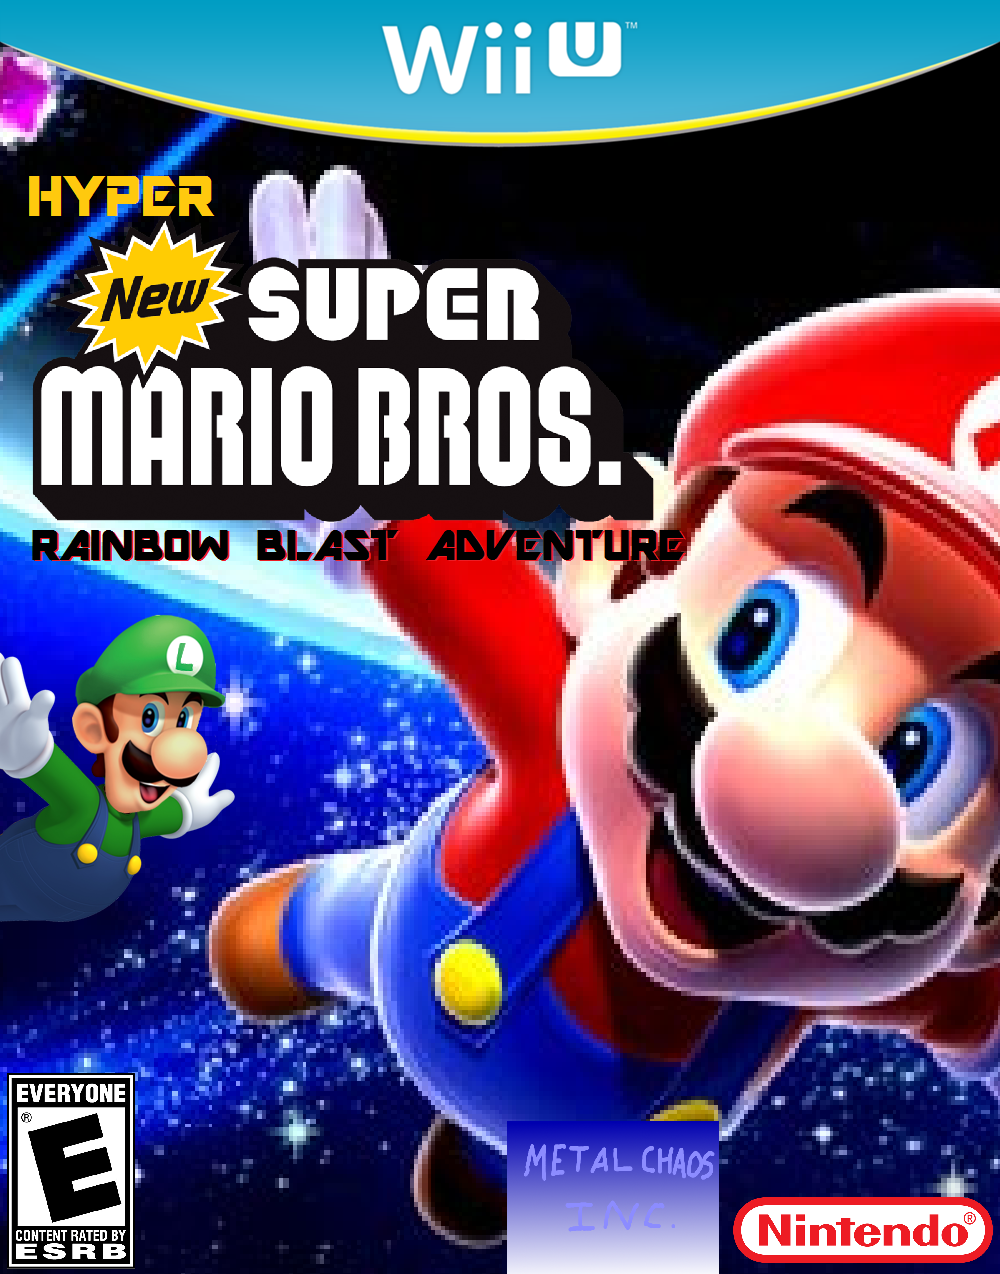 Hyper New Super Mario Bros. Rainbow Blast Adventure